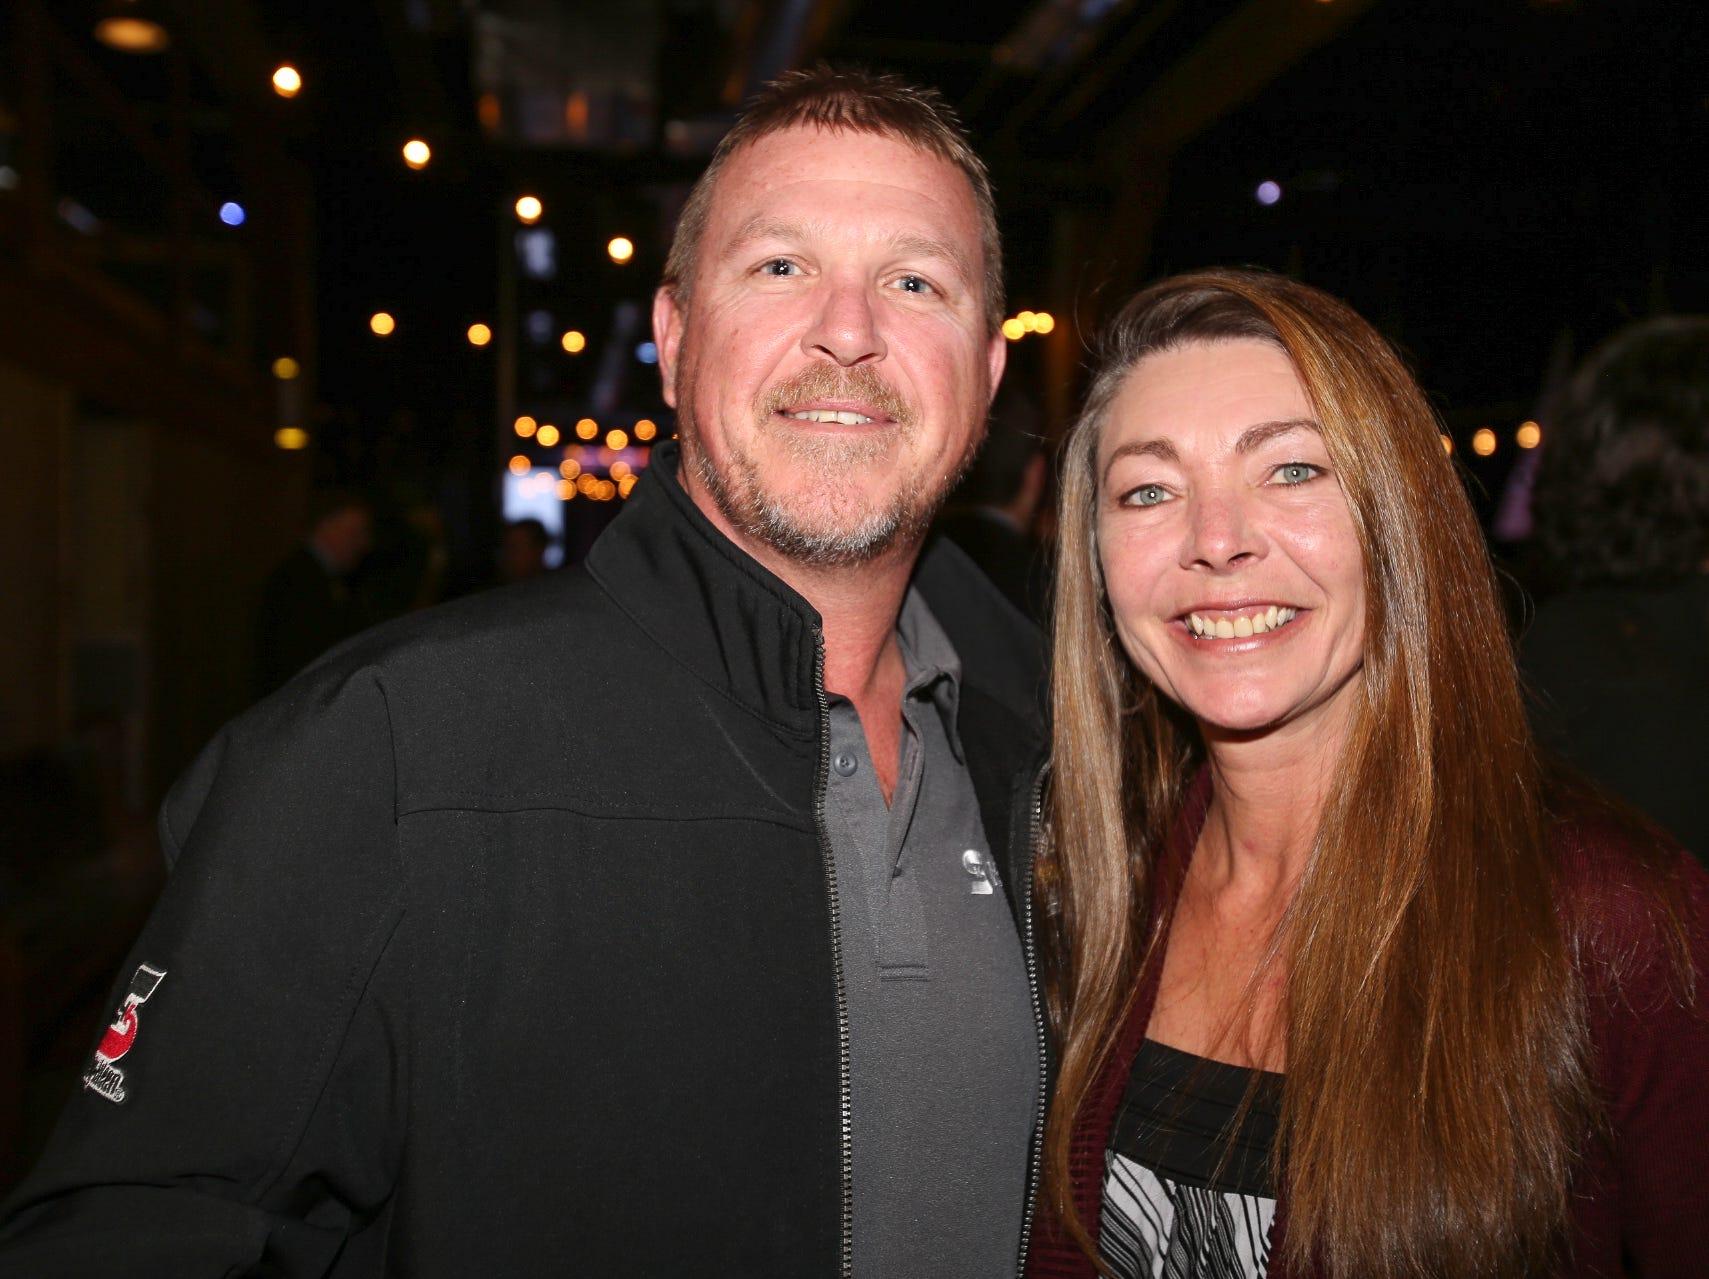 Jeremy and Terri McFarland